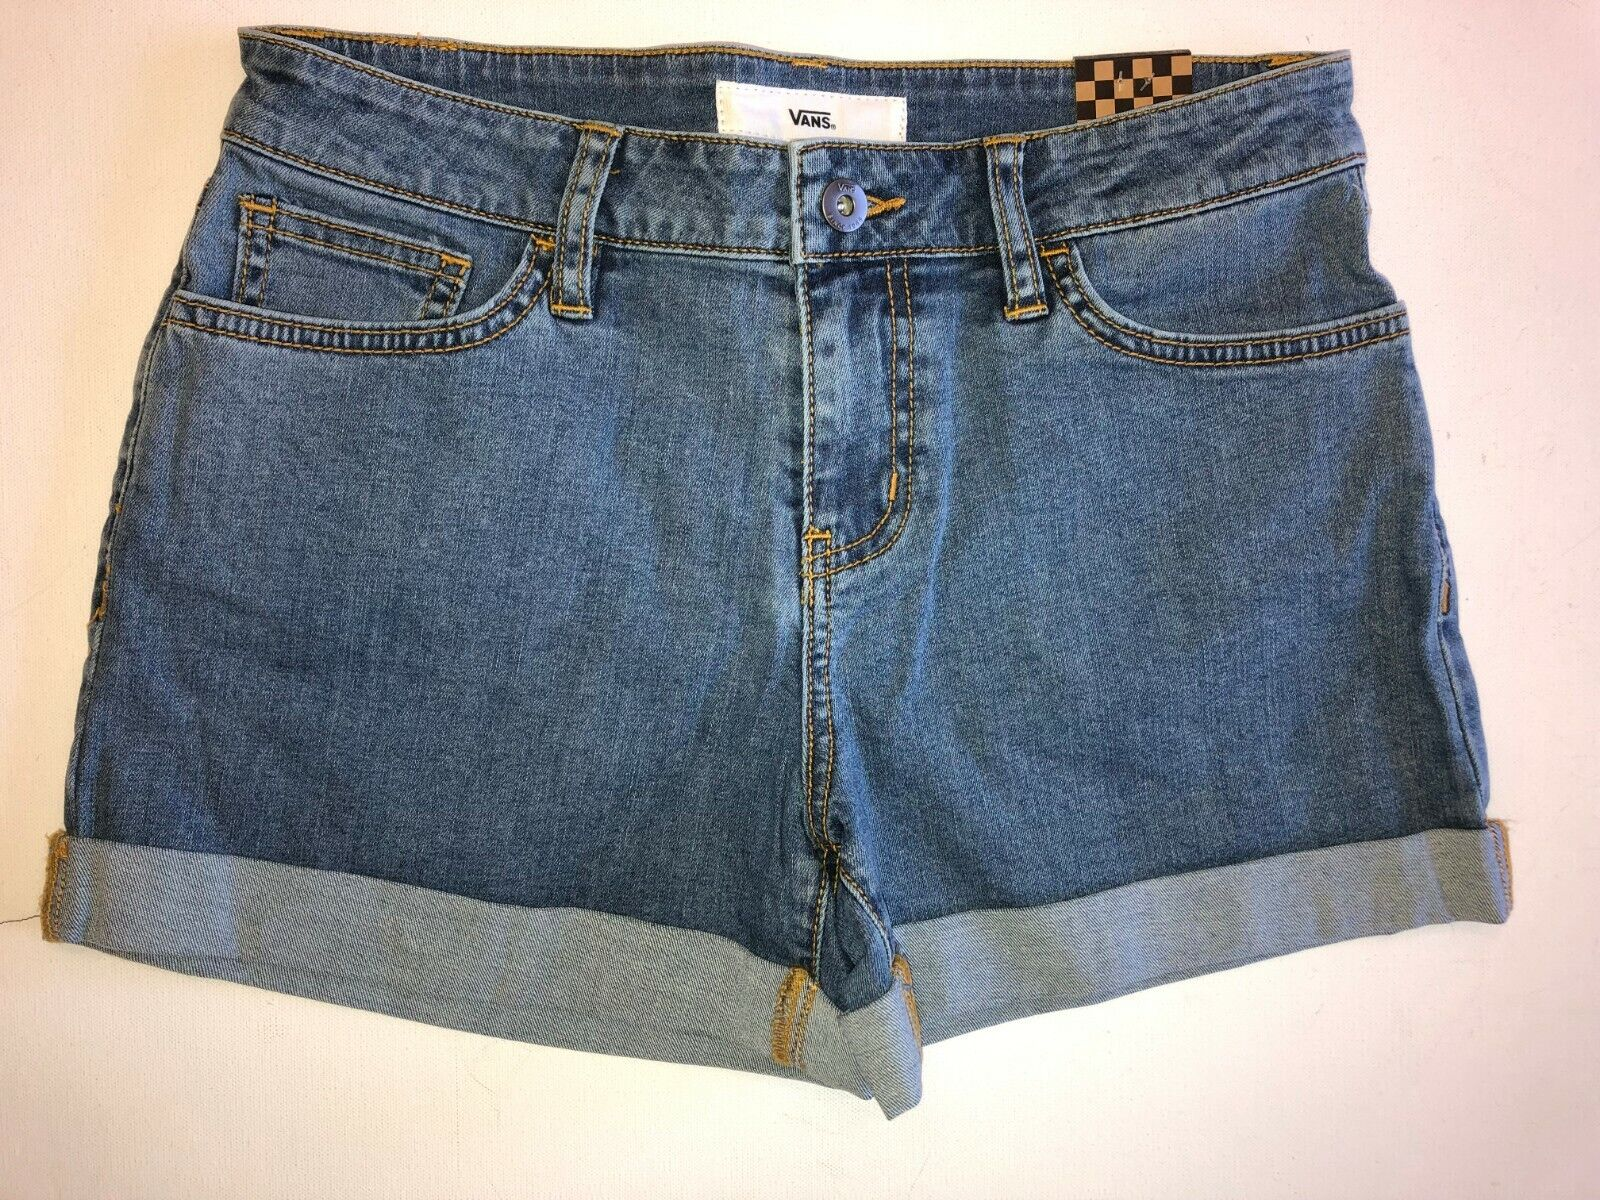 NEW Vans Boyfriend Cuff Jean Shorts Women's Size 26